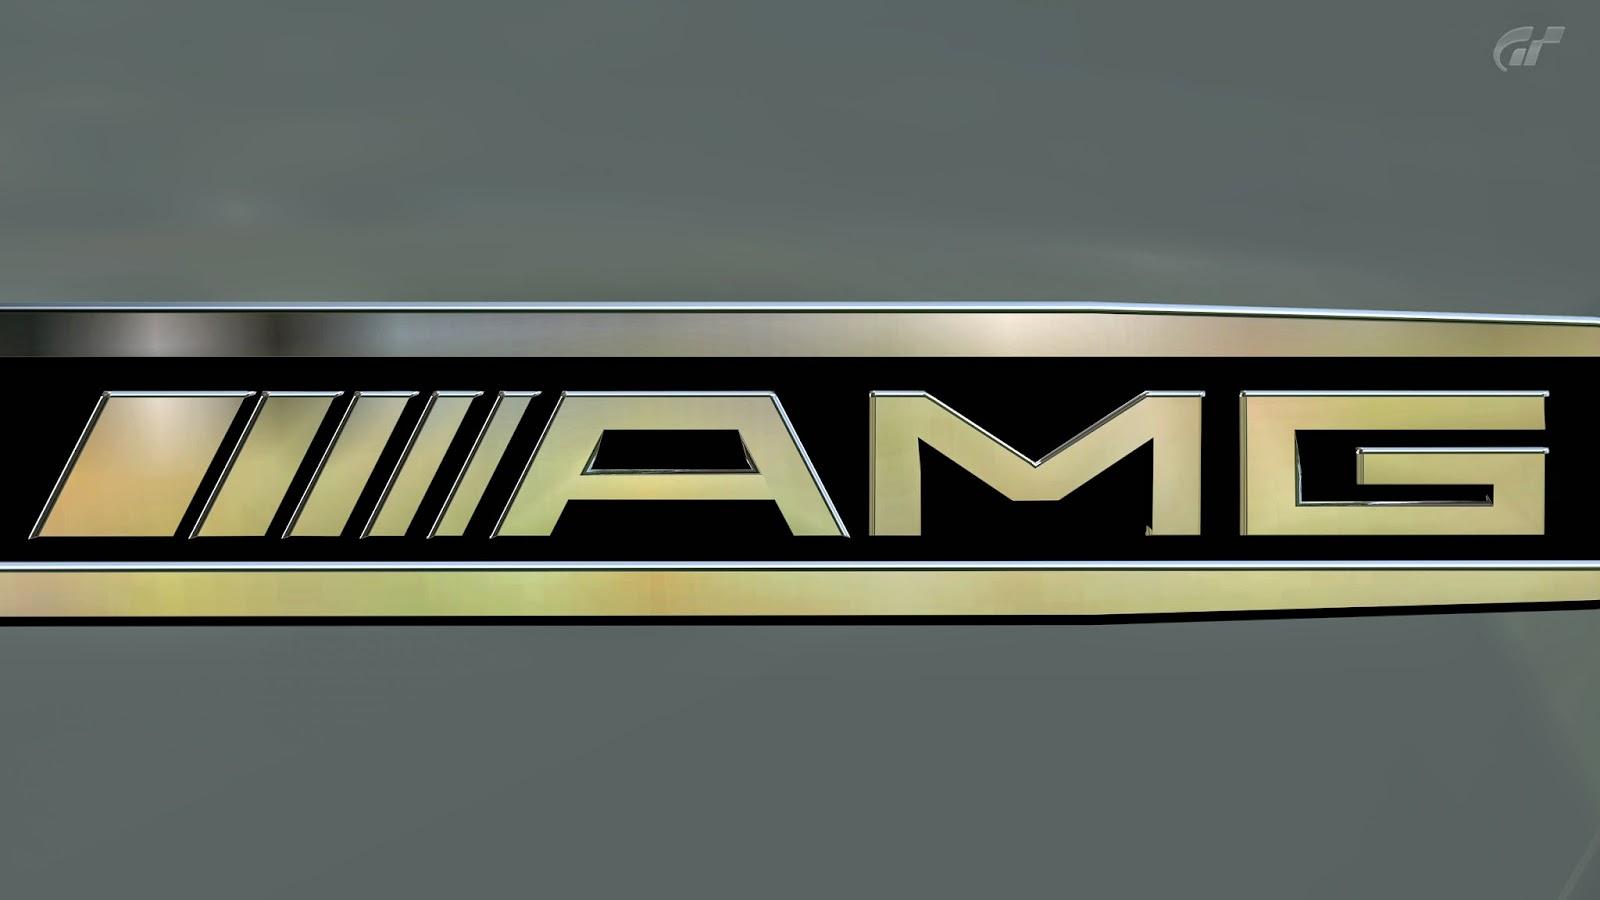 New car extramach mercedes benz amg logo for Mercedes benz amg logo